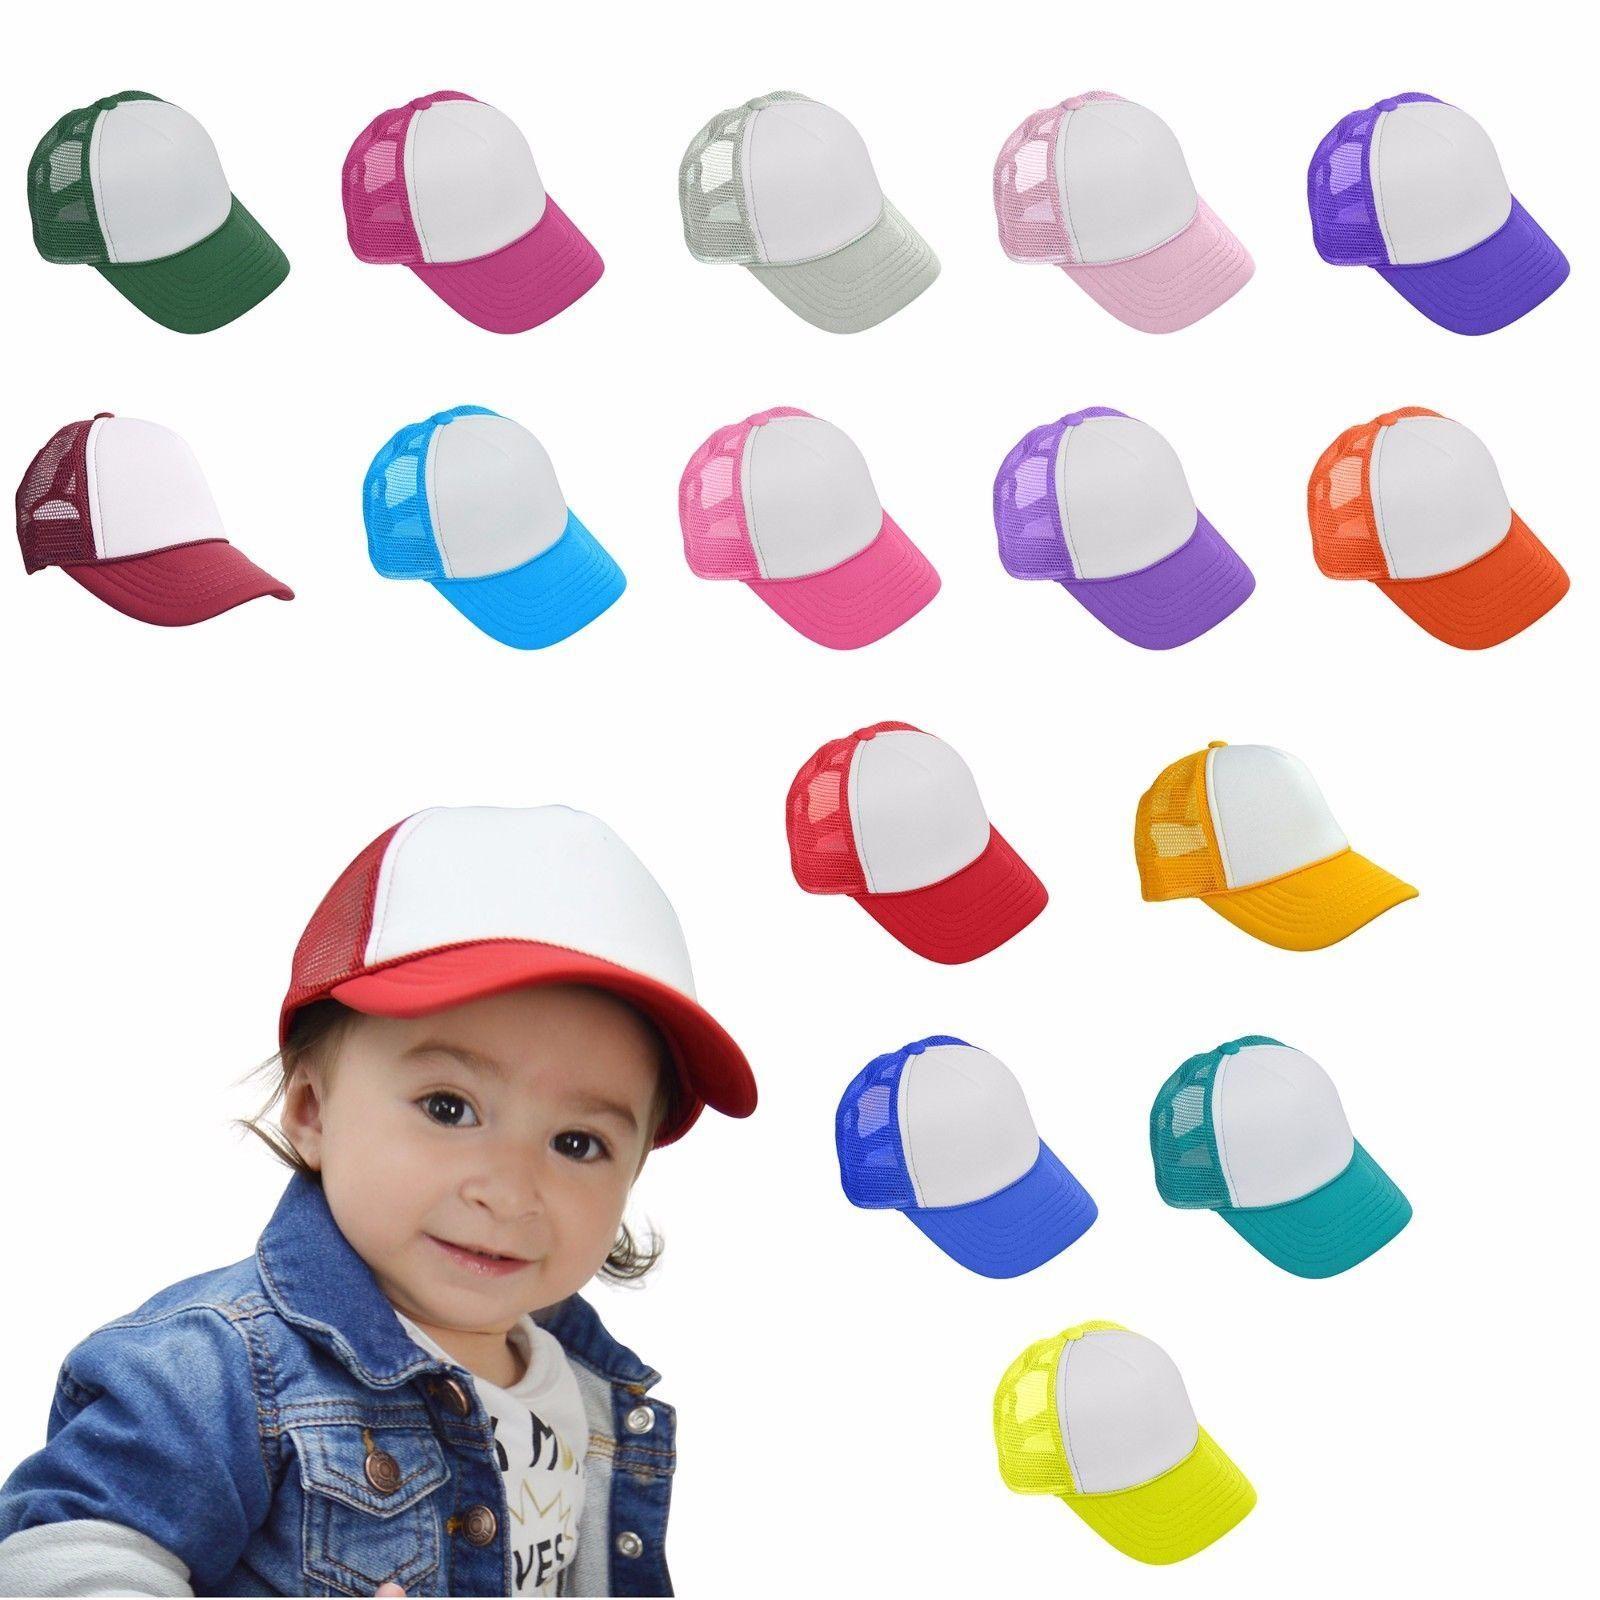 21 colors Kids Trucker Cap children Mesh Caps Blank Trucker Hats Snapback Hats Girls Boys Toddler Cap ZC012 50pcs